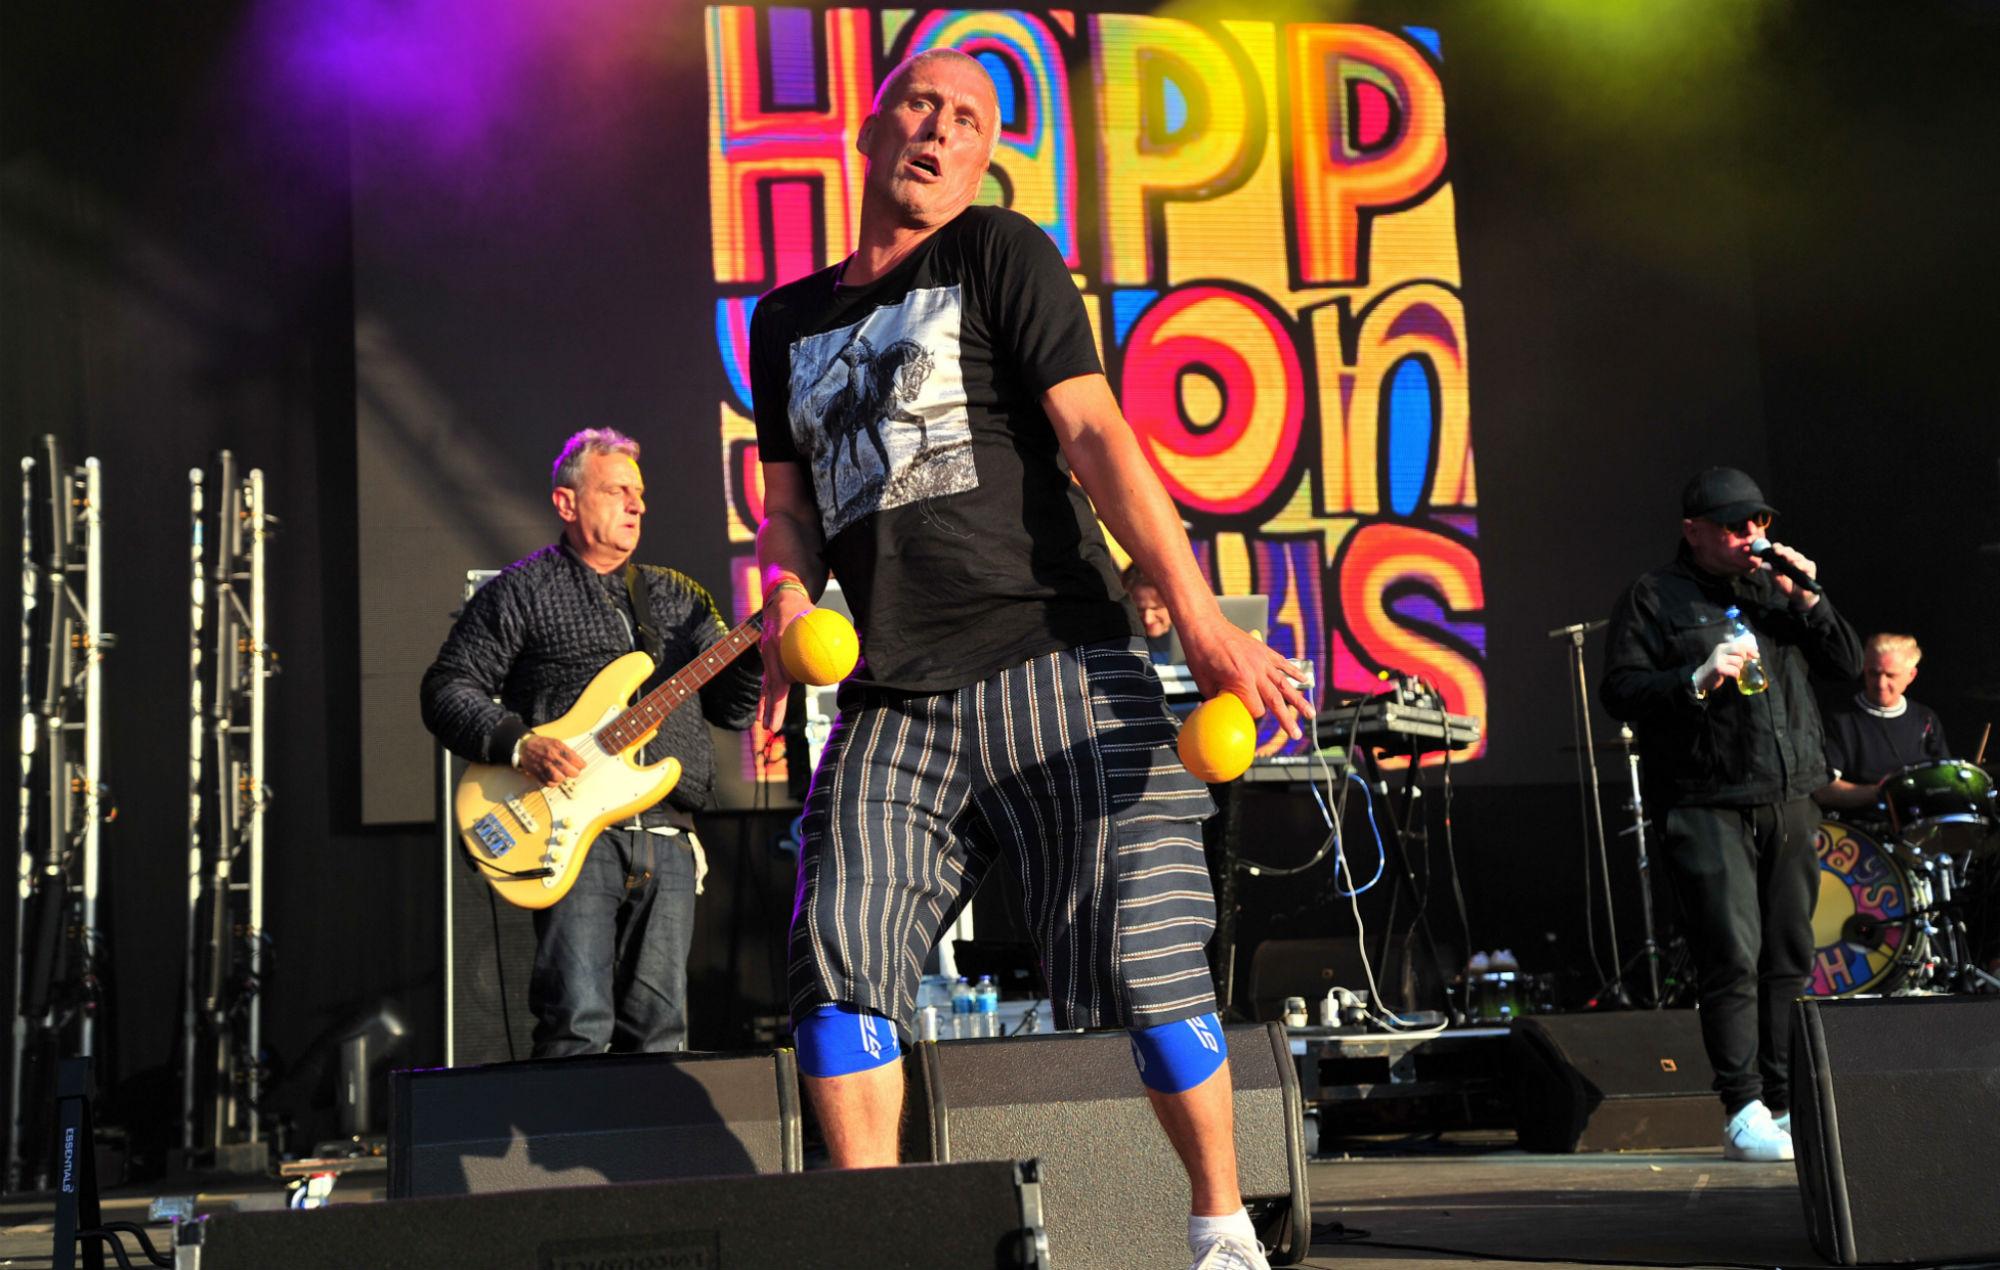 Visor Fest, which Happy Mondays were due to headline, in Benidorm has been cancelled